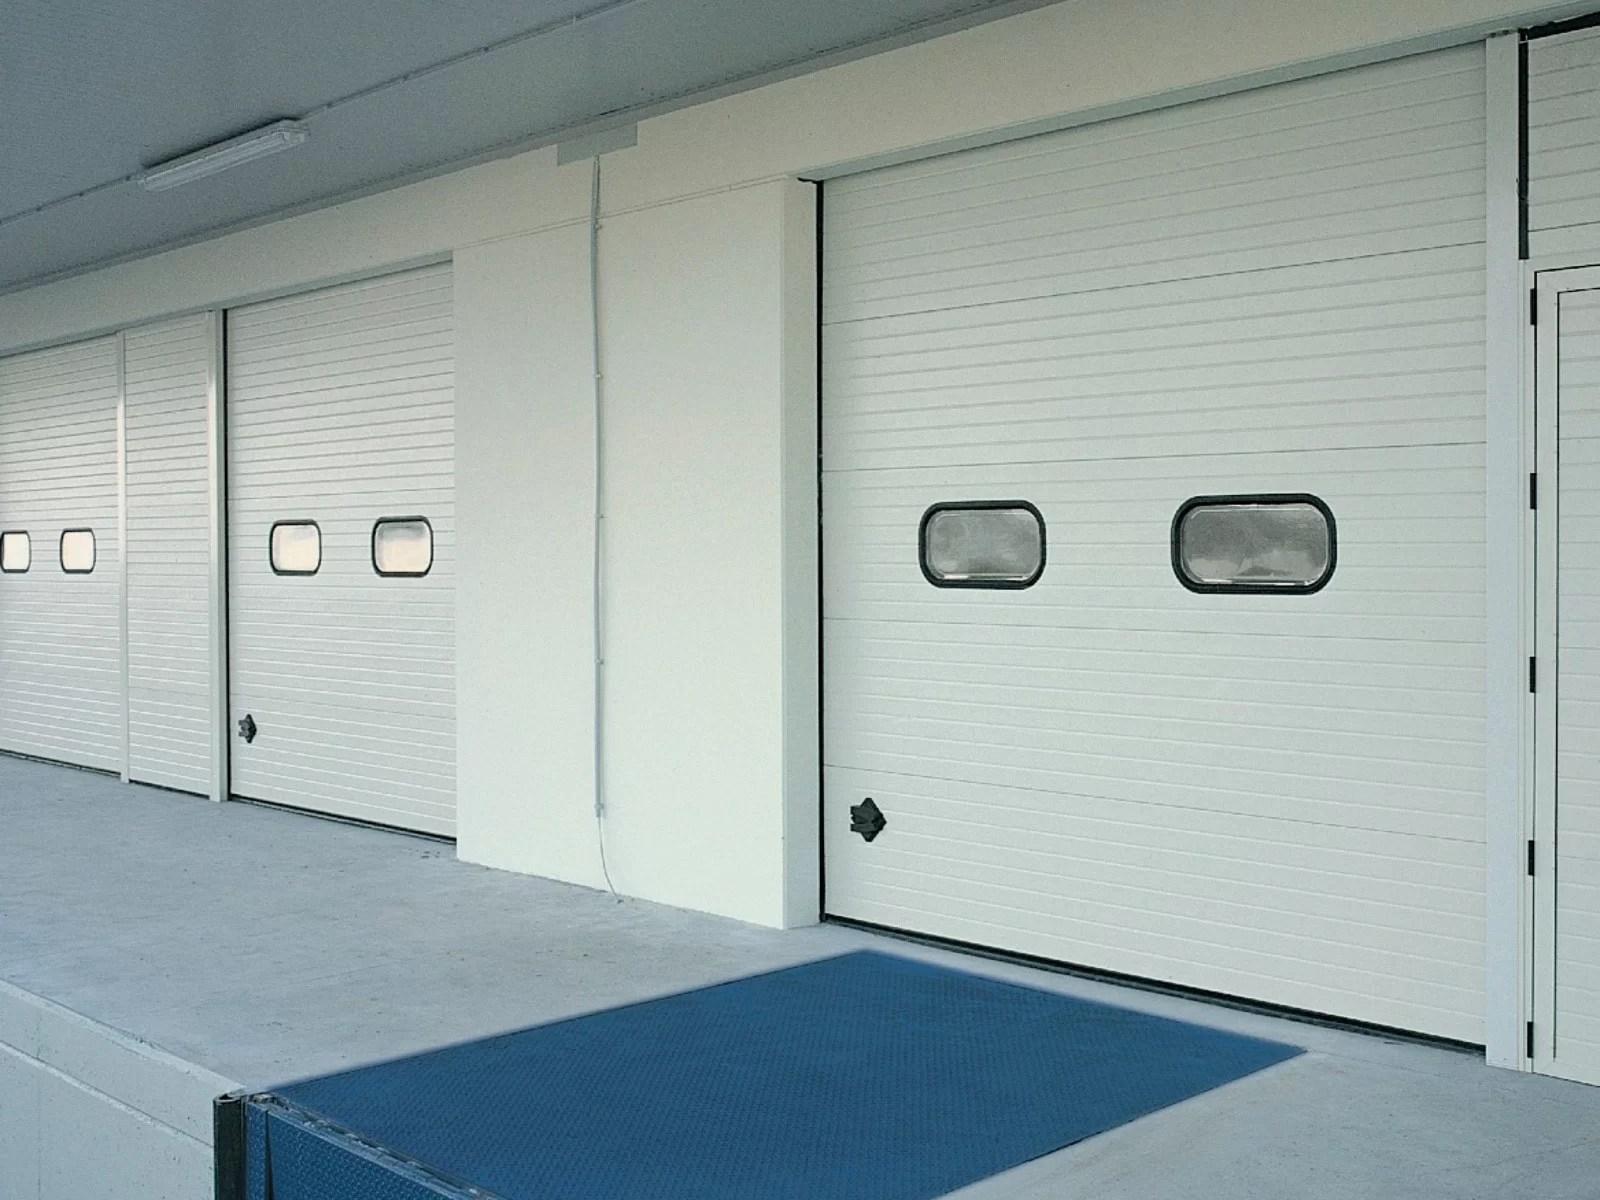 Portone sezionale industriale CARGO - Stucco banco C21